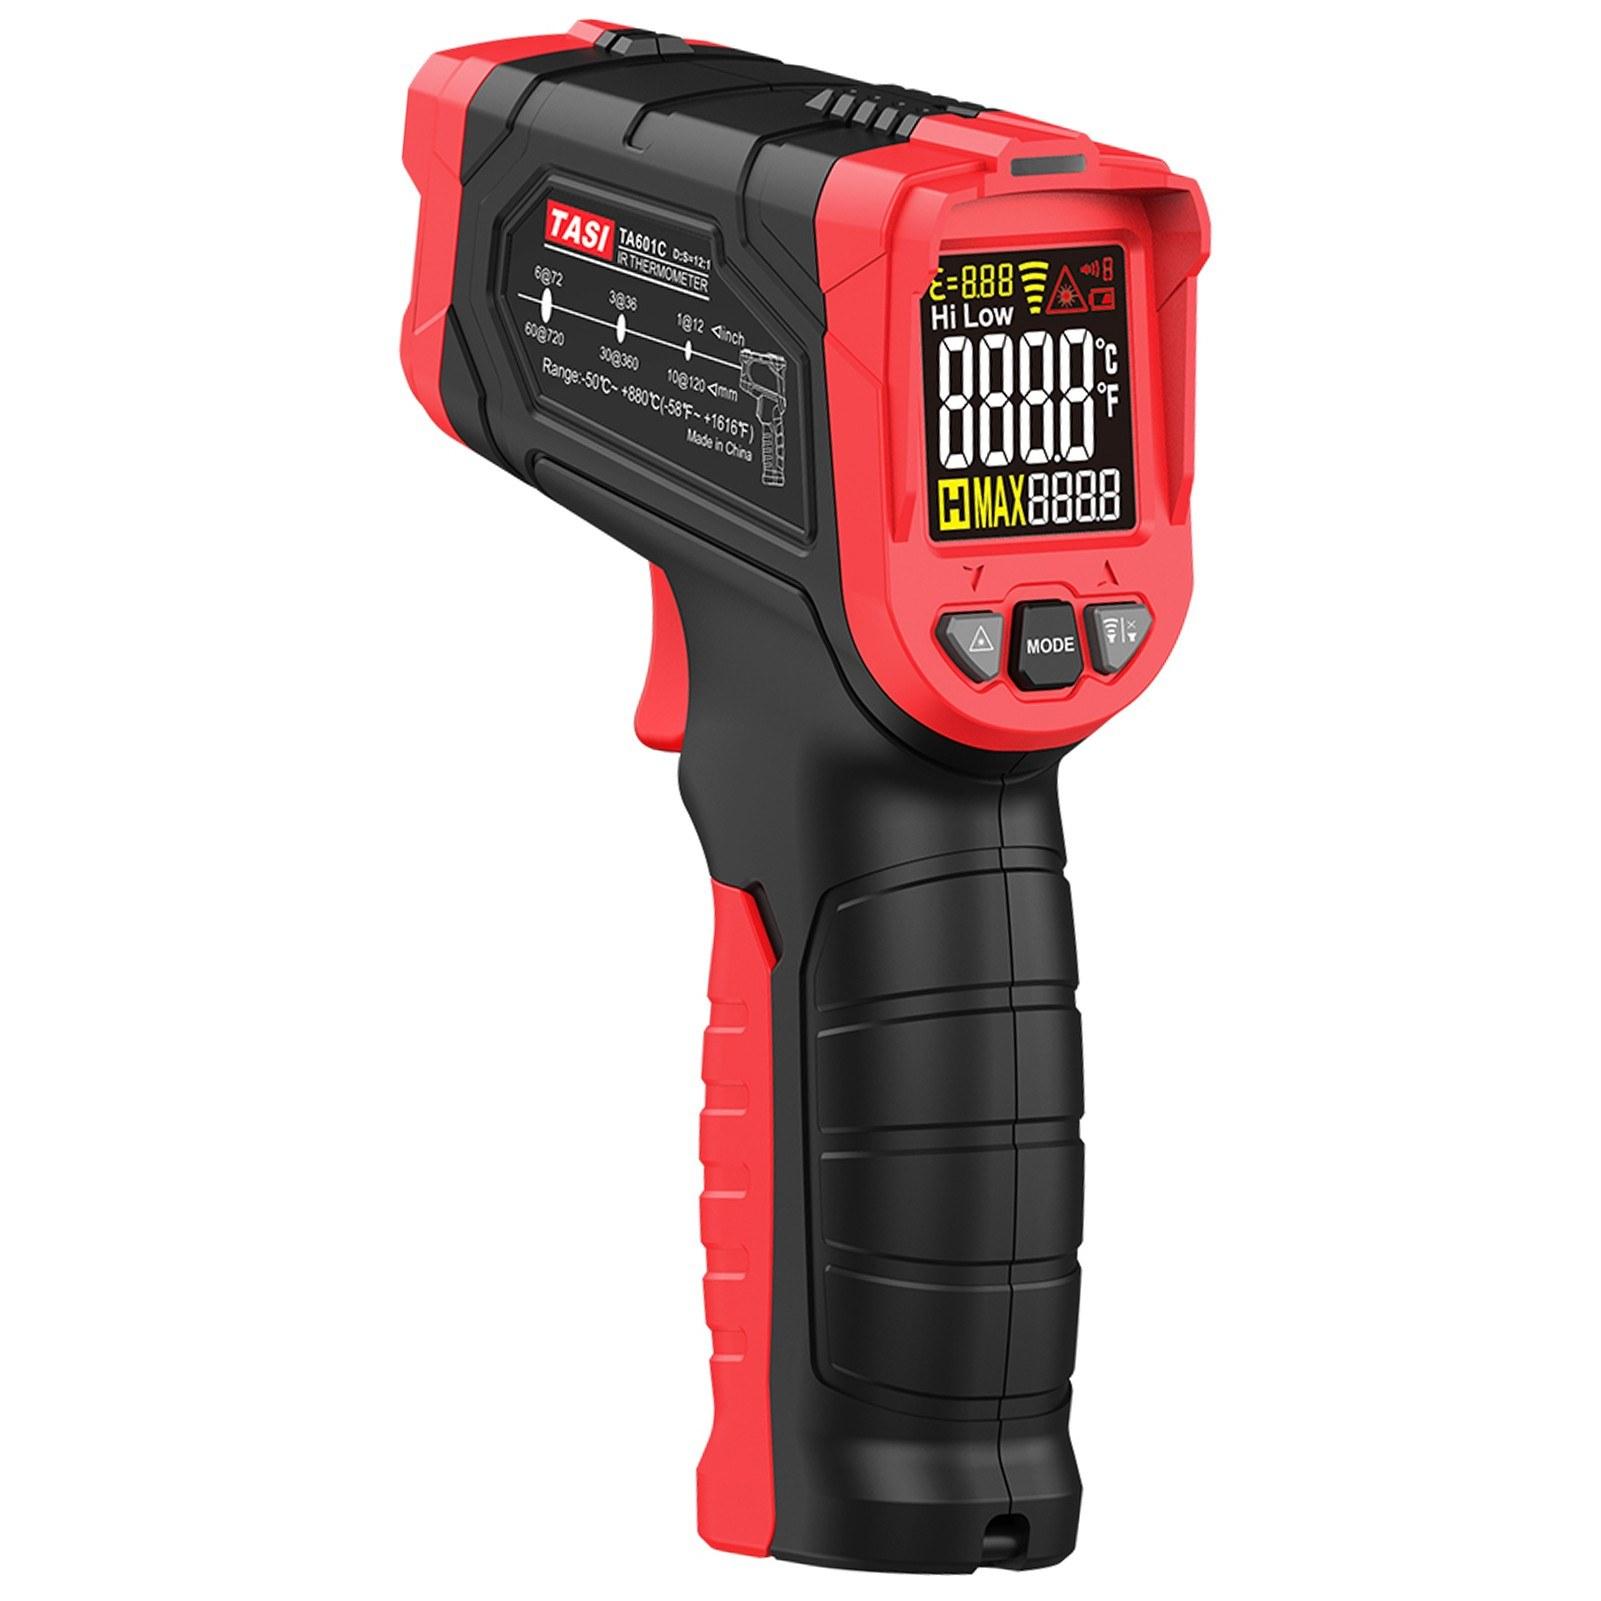 TASI Non-contact IR Infrared Thermometer Digital Handheld Temperature Tester 12:1 Pyrometer Color LCD Display Backlight Centigrade Fahrenheit -50uff5e880u2103(-58uff5e1616u2109)